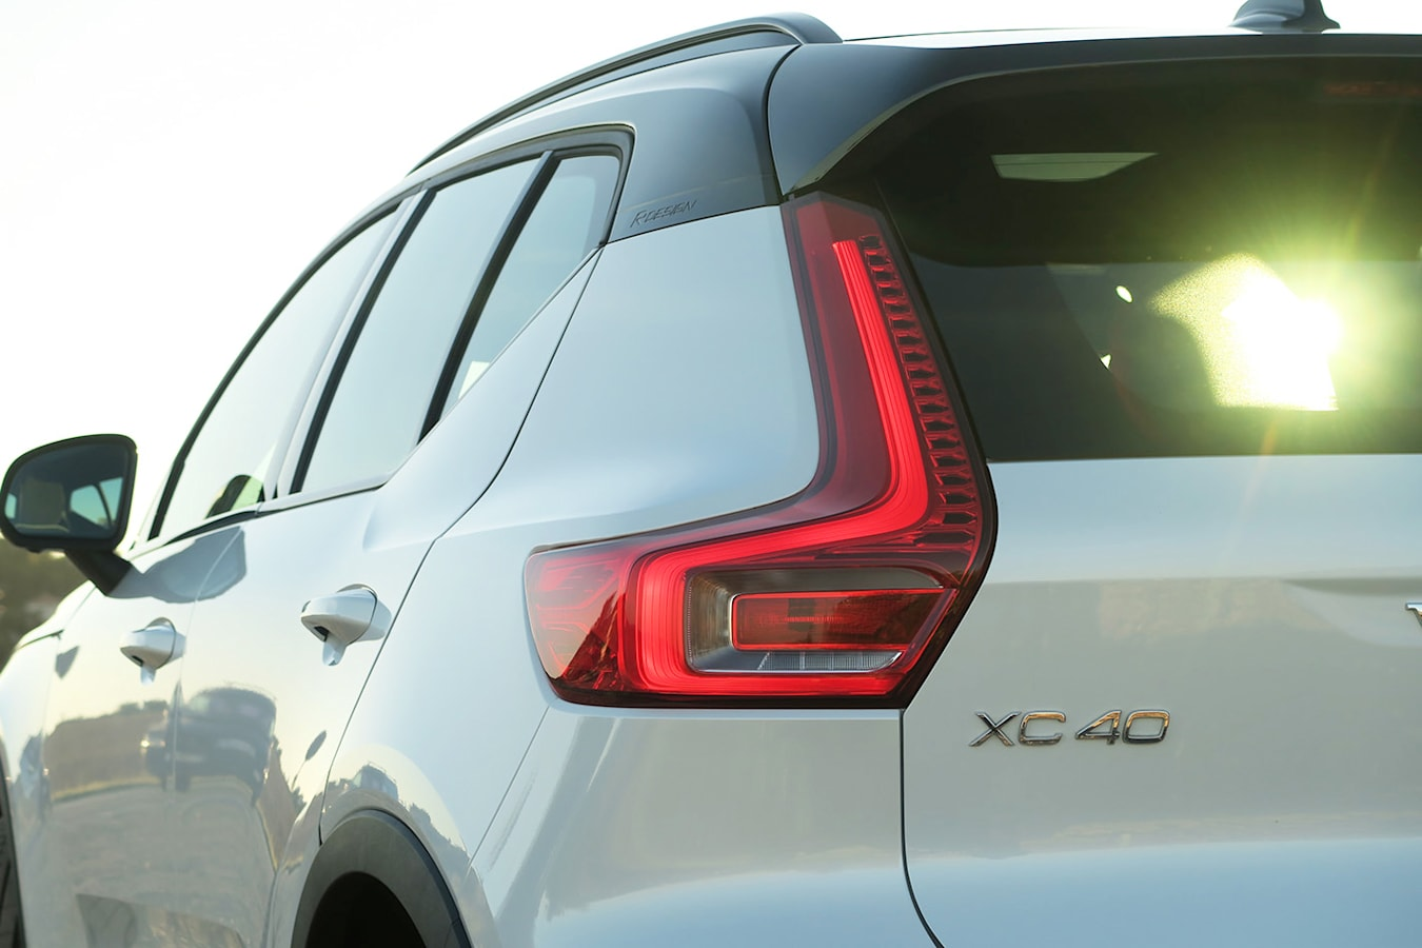 2018 Volvo Xc 40 Rear Close Jpg